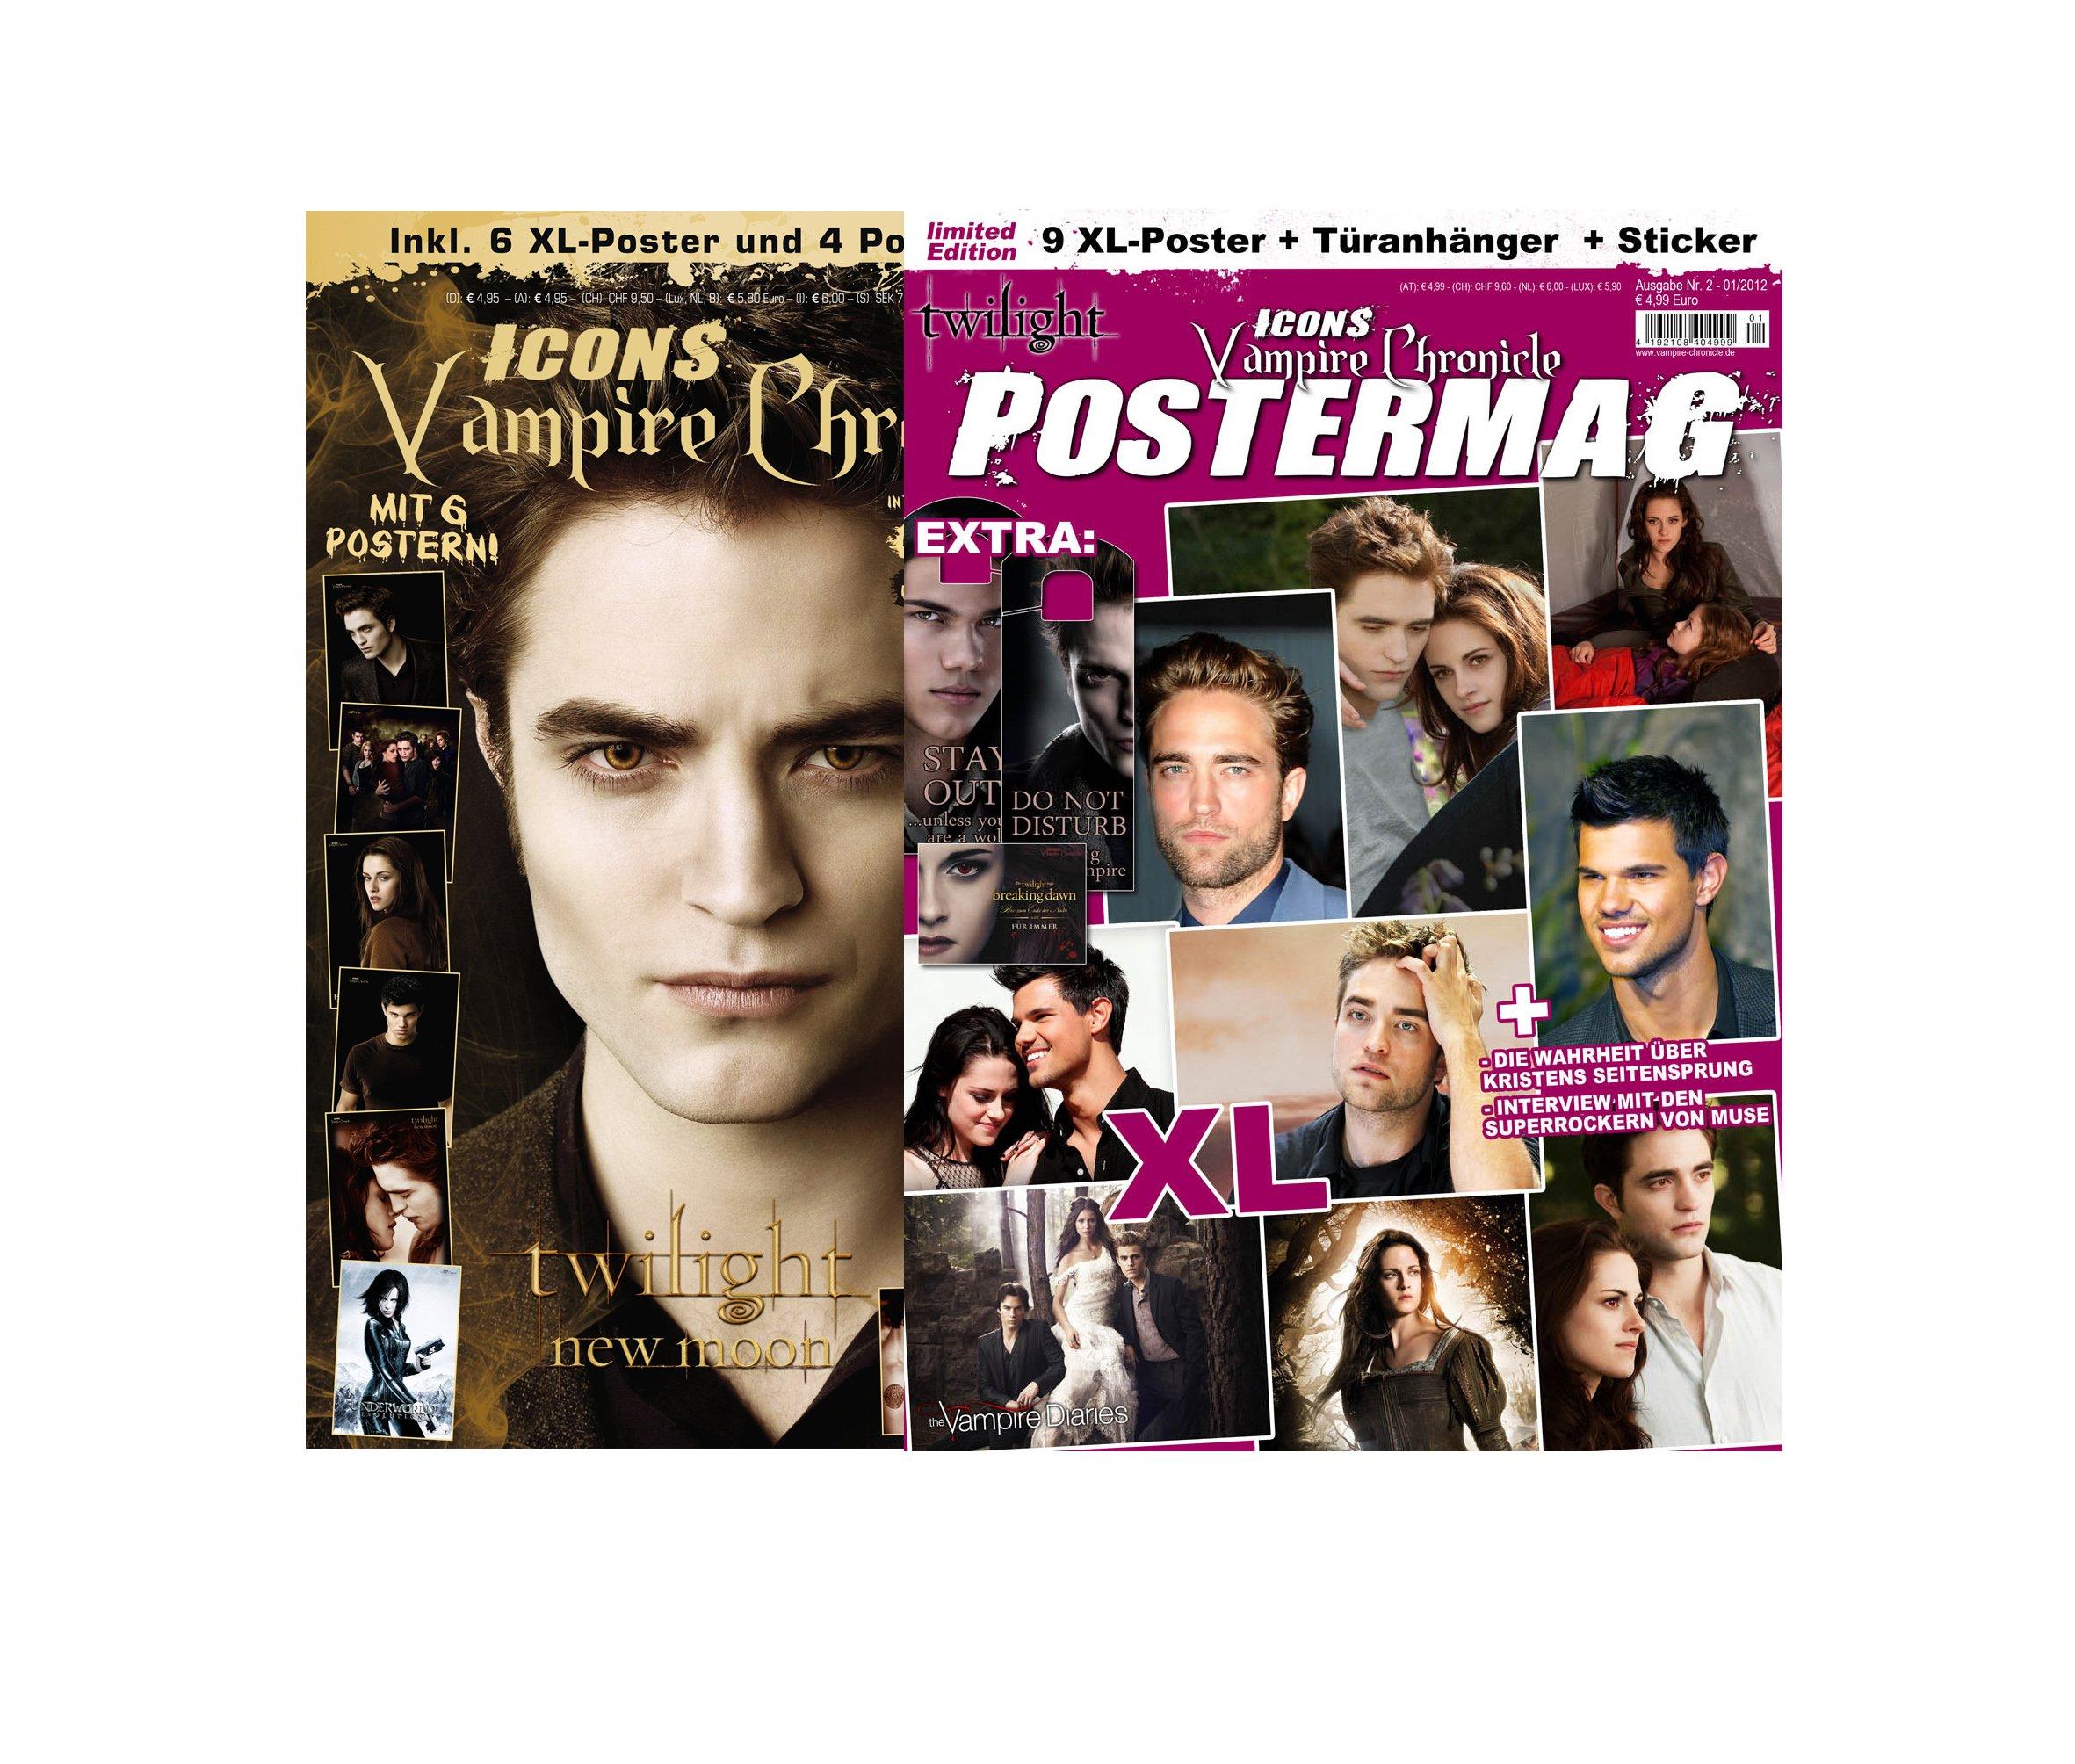 Icons Vampire Chronicle, limitiertes Bundle (2 Ausgaben): Postermag 2 + Twilight: New Moon inkl. 15 XL-Poster von Twilight, Robert Pattinson u.v.m. + 15 XL-Poster, Sticker, Türanhänger Broschiert – 31. August 2012 Thomas Vogel Media e. K. Türanhänger 39425